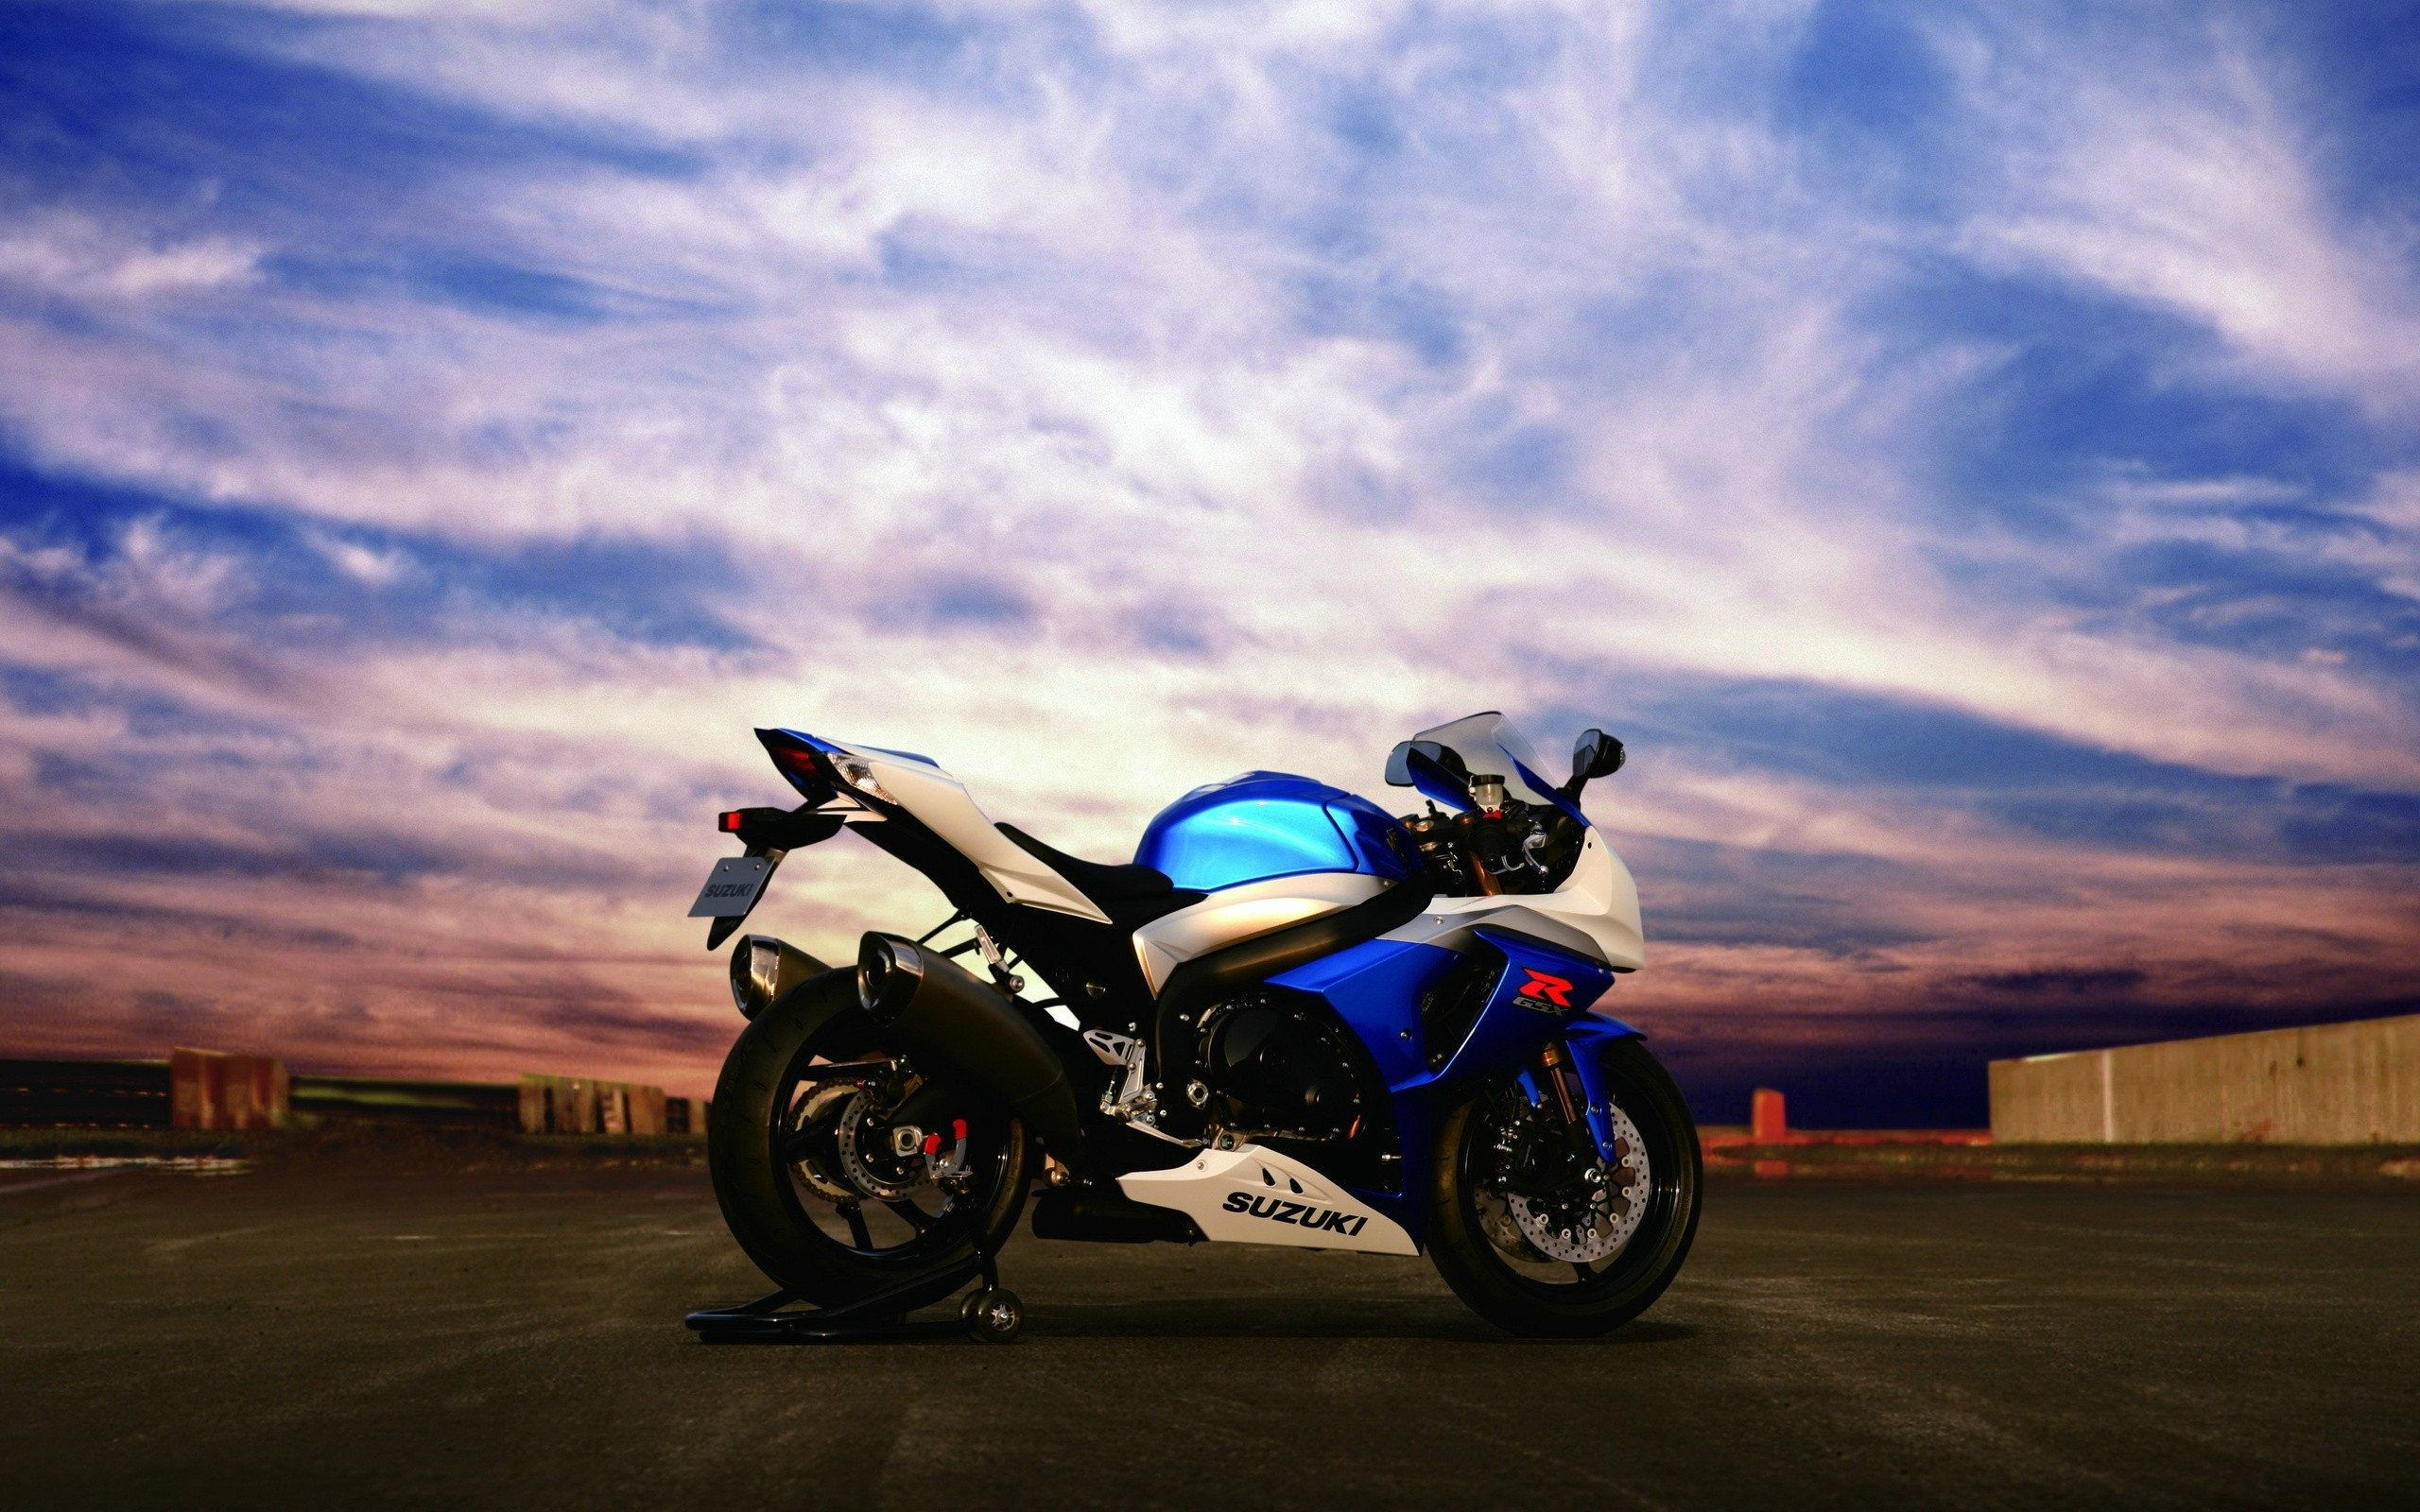 1920x1440 Motorcycle Hd Suzuki Hayabusa Gsxr Fondos 721364 Wallpaper  Wallpaper